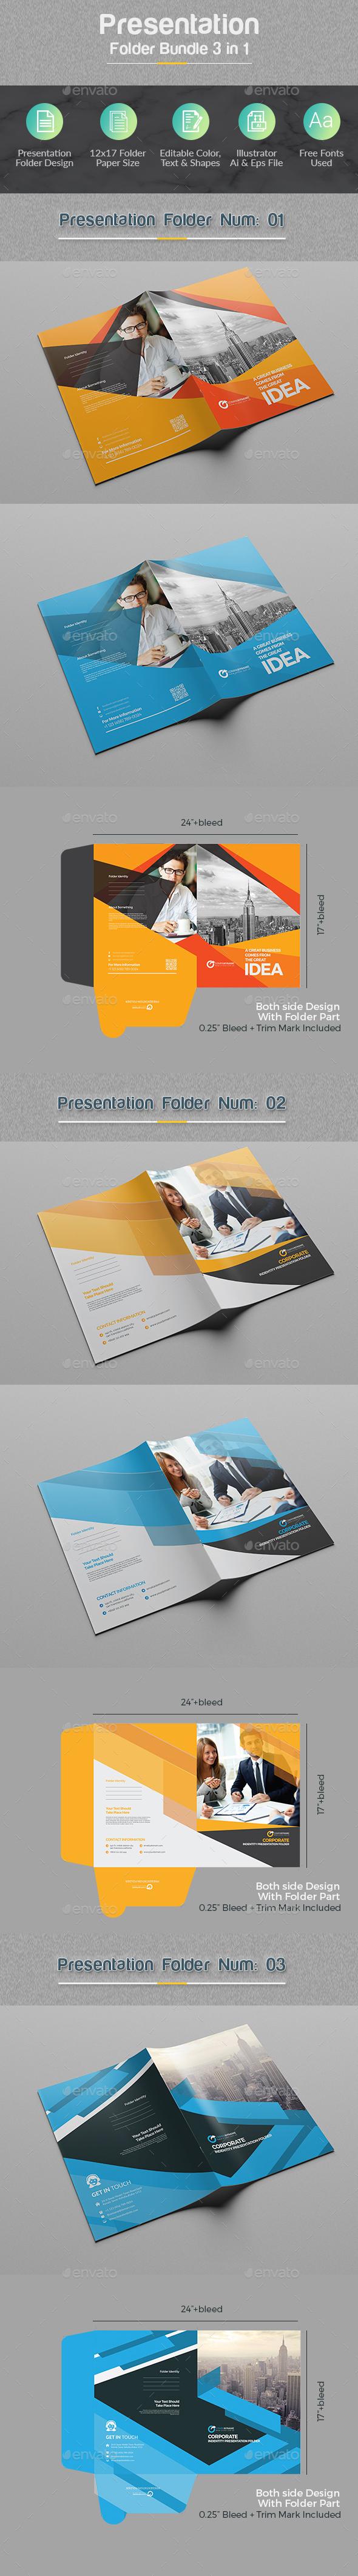 Presentation Folder Bundle 3 in 1 - Stationery Print Templates